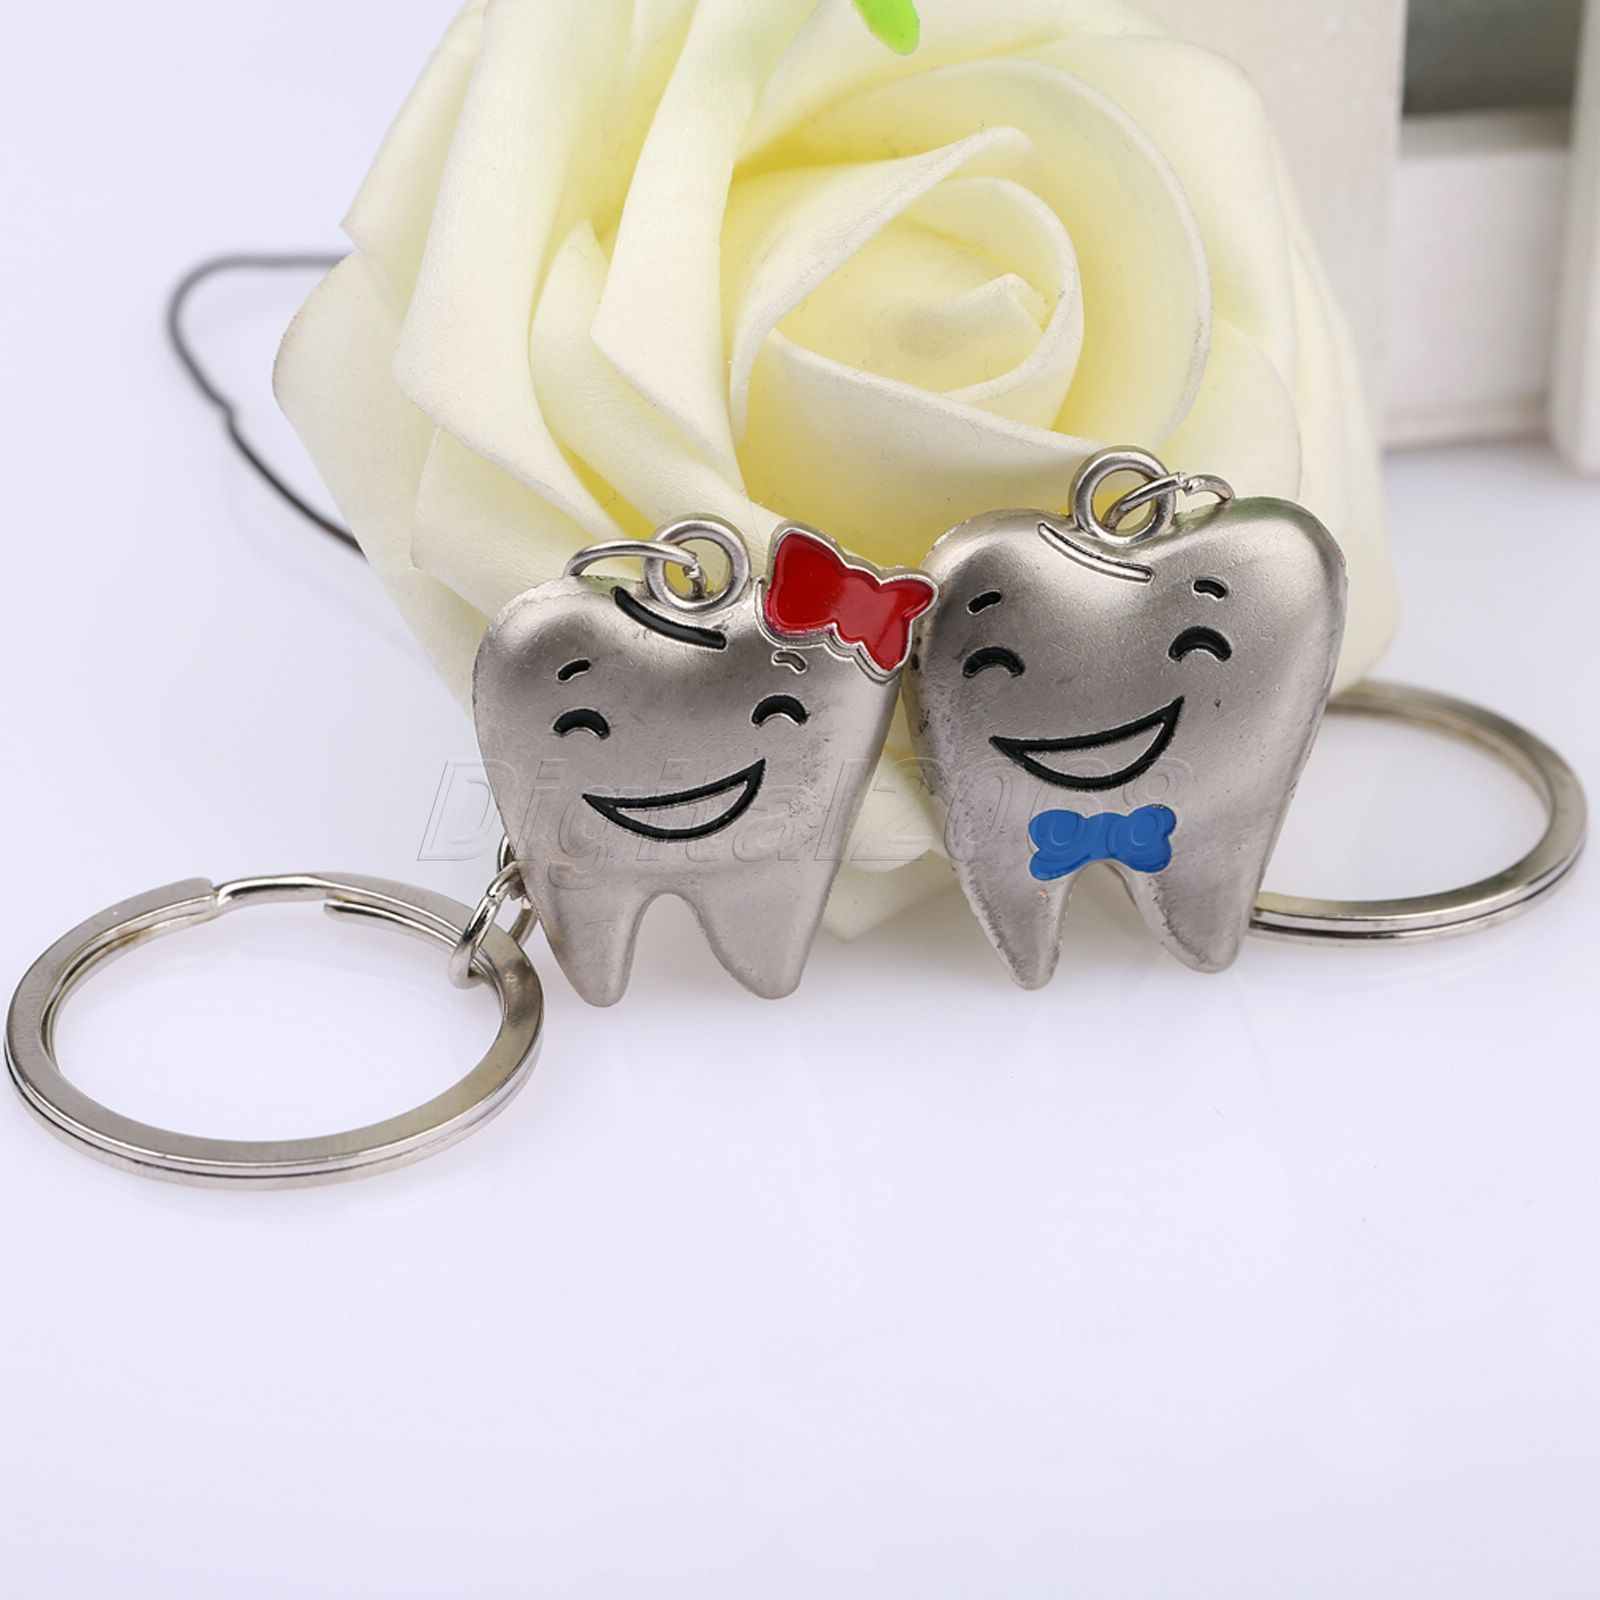 Pin De Cattleya White En Protesis Dentales Ortodoncia Protesis